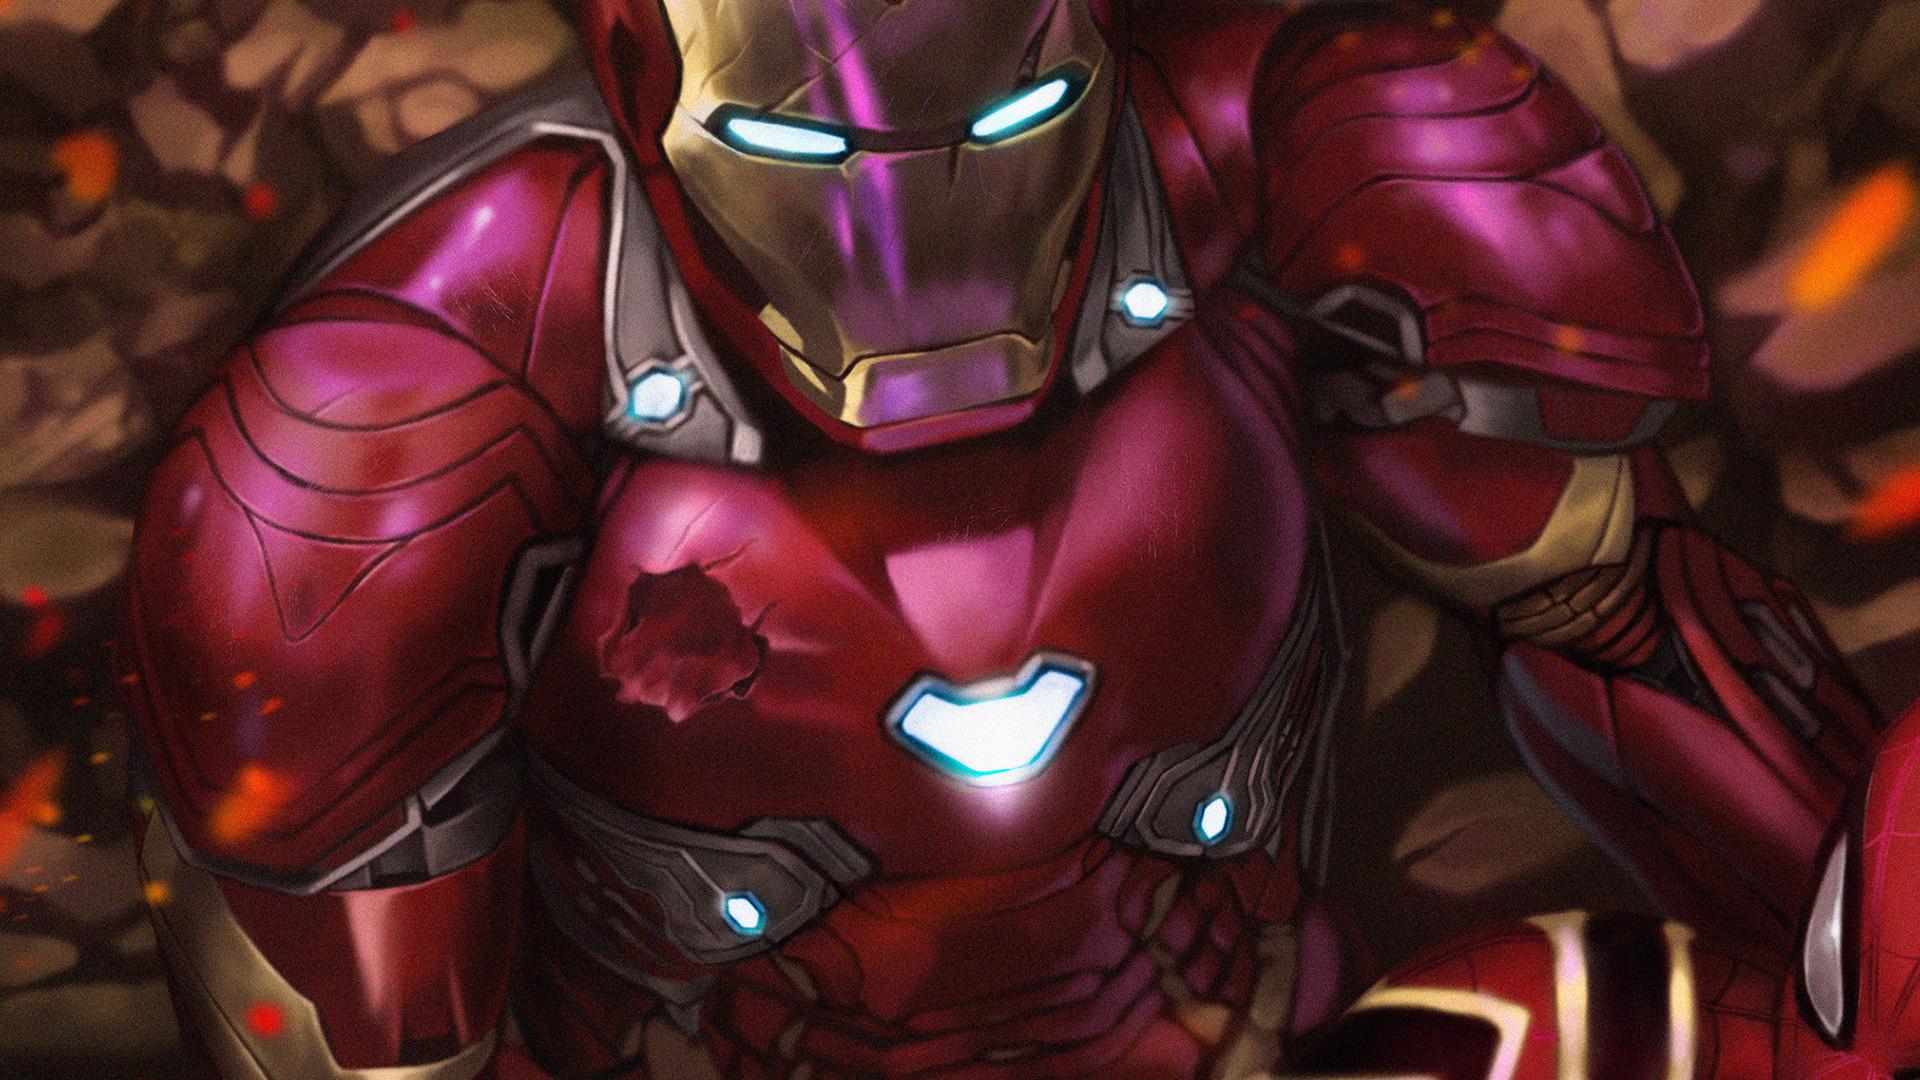 hd pics of iron man